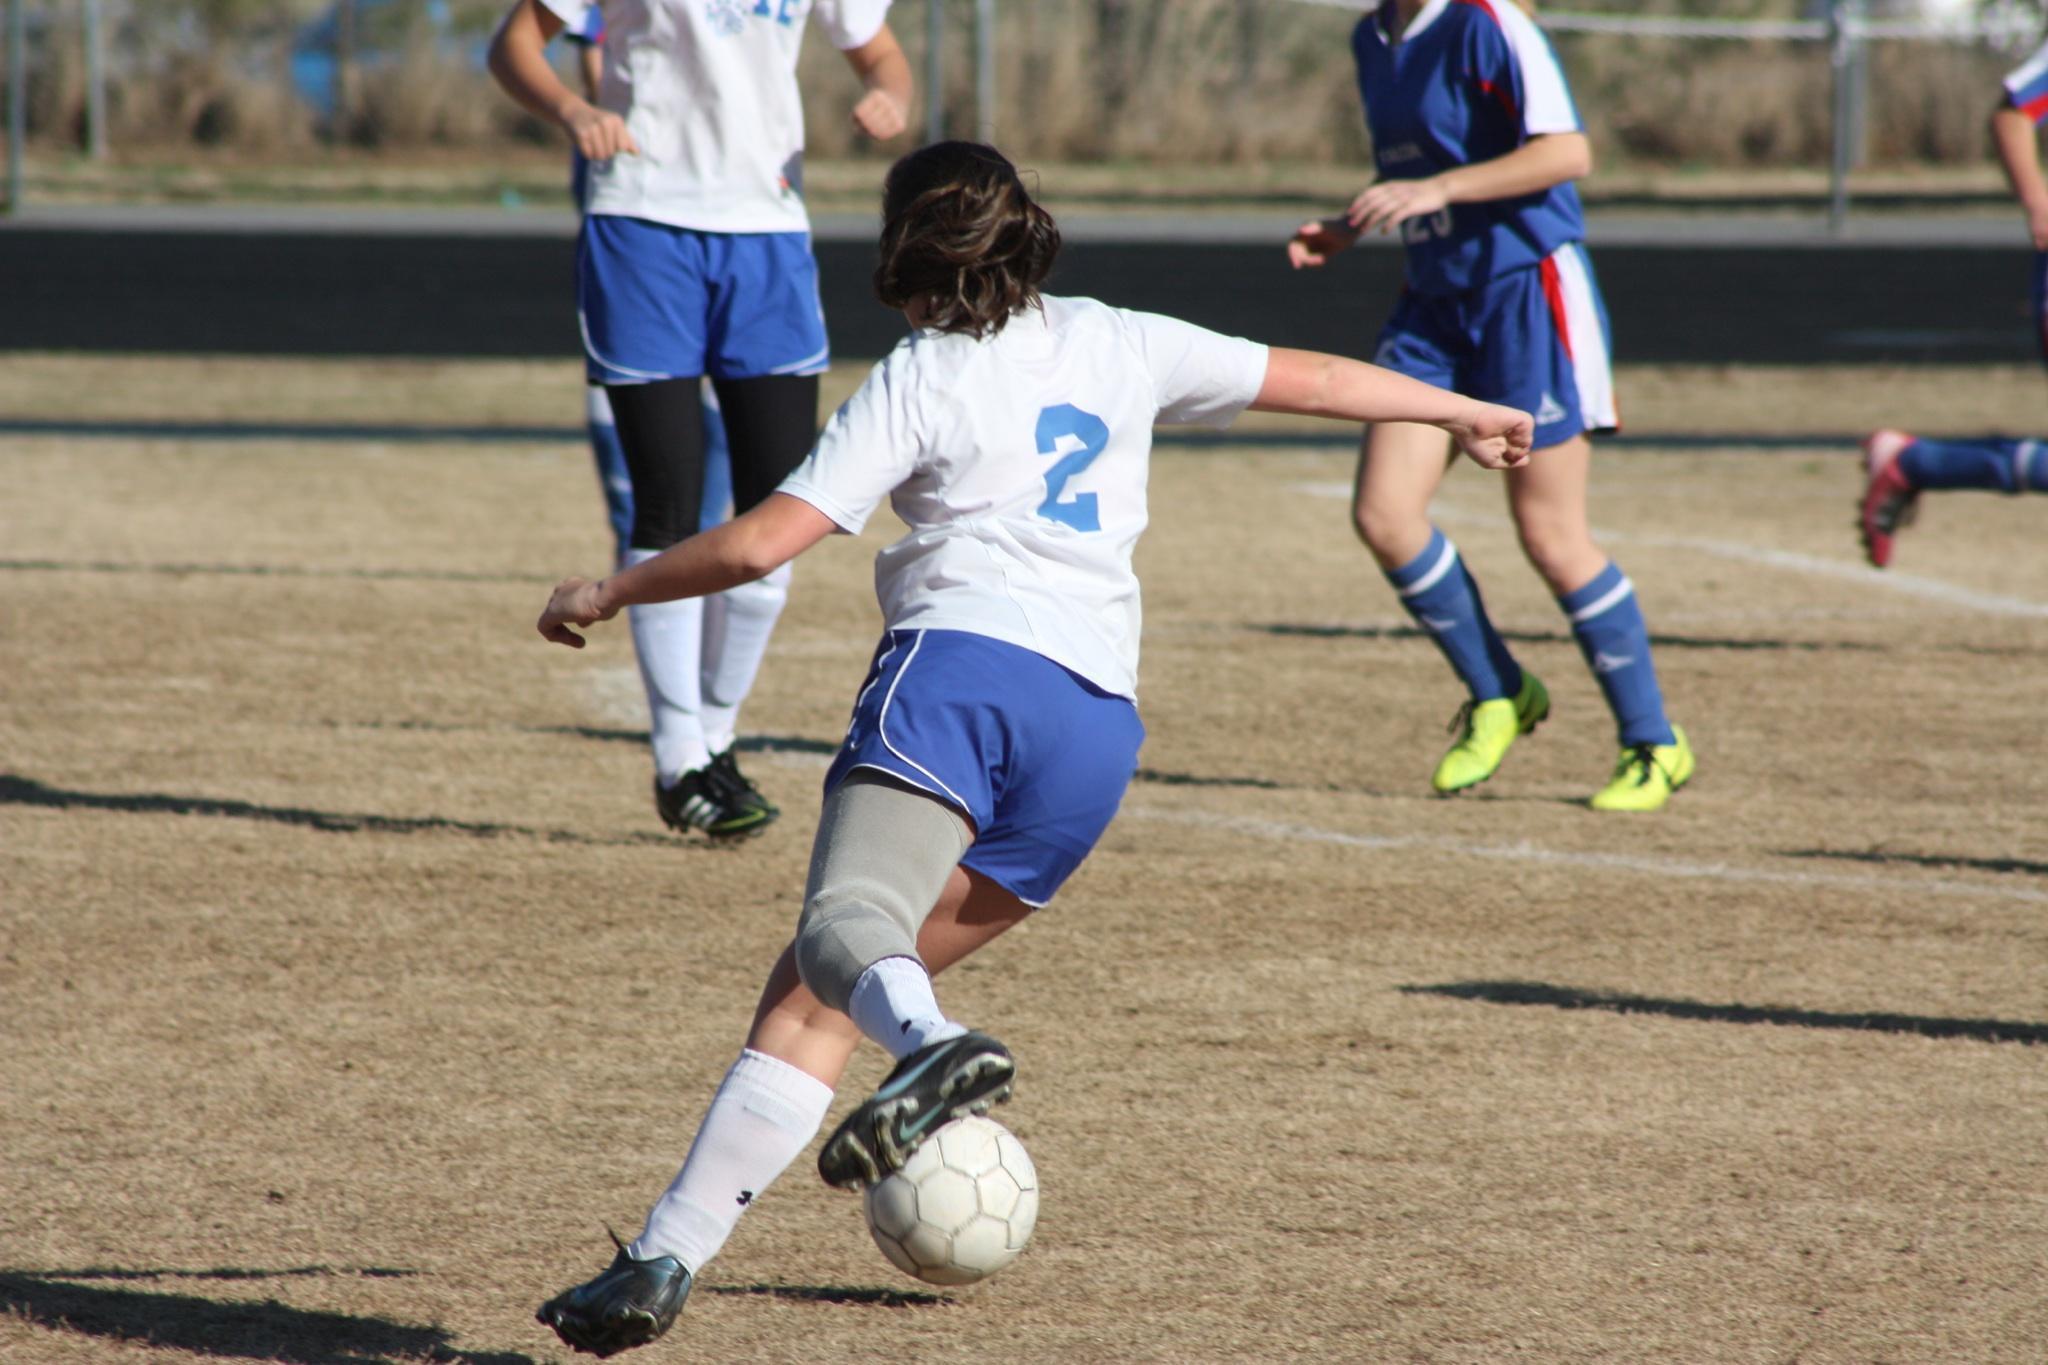 leg-prosthesis-football.jpg